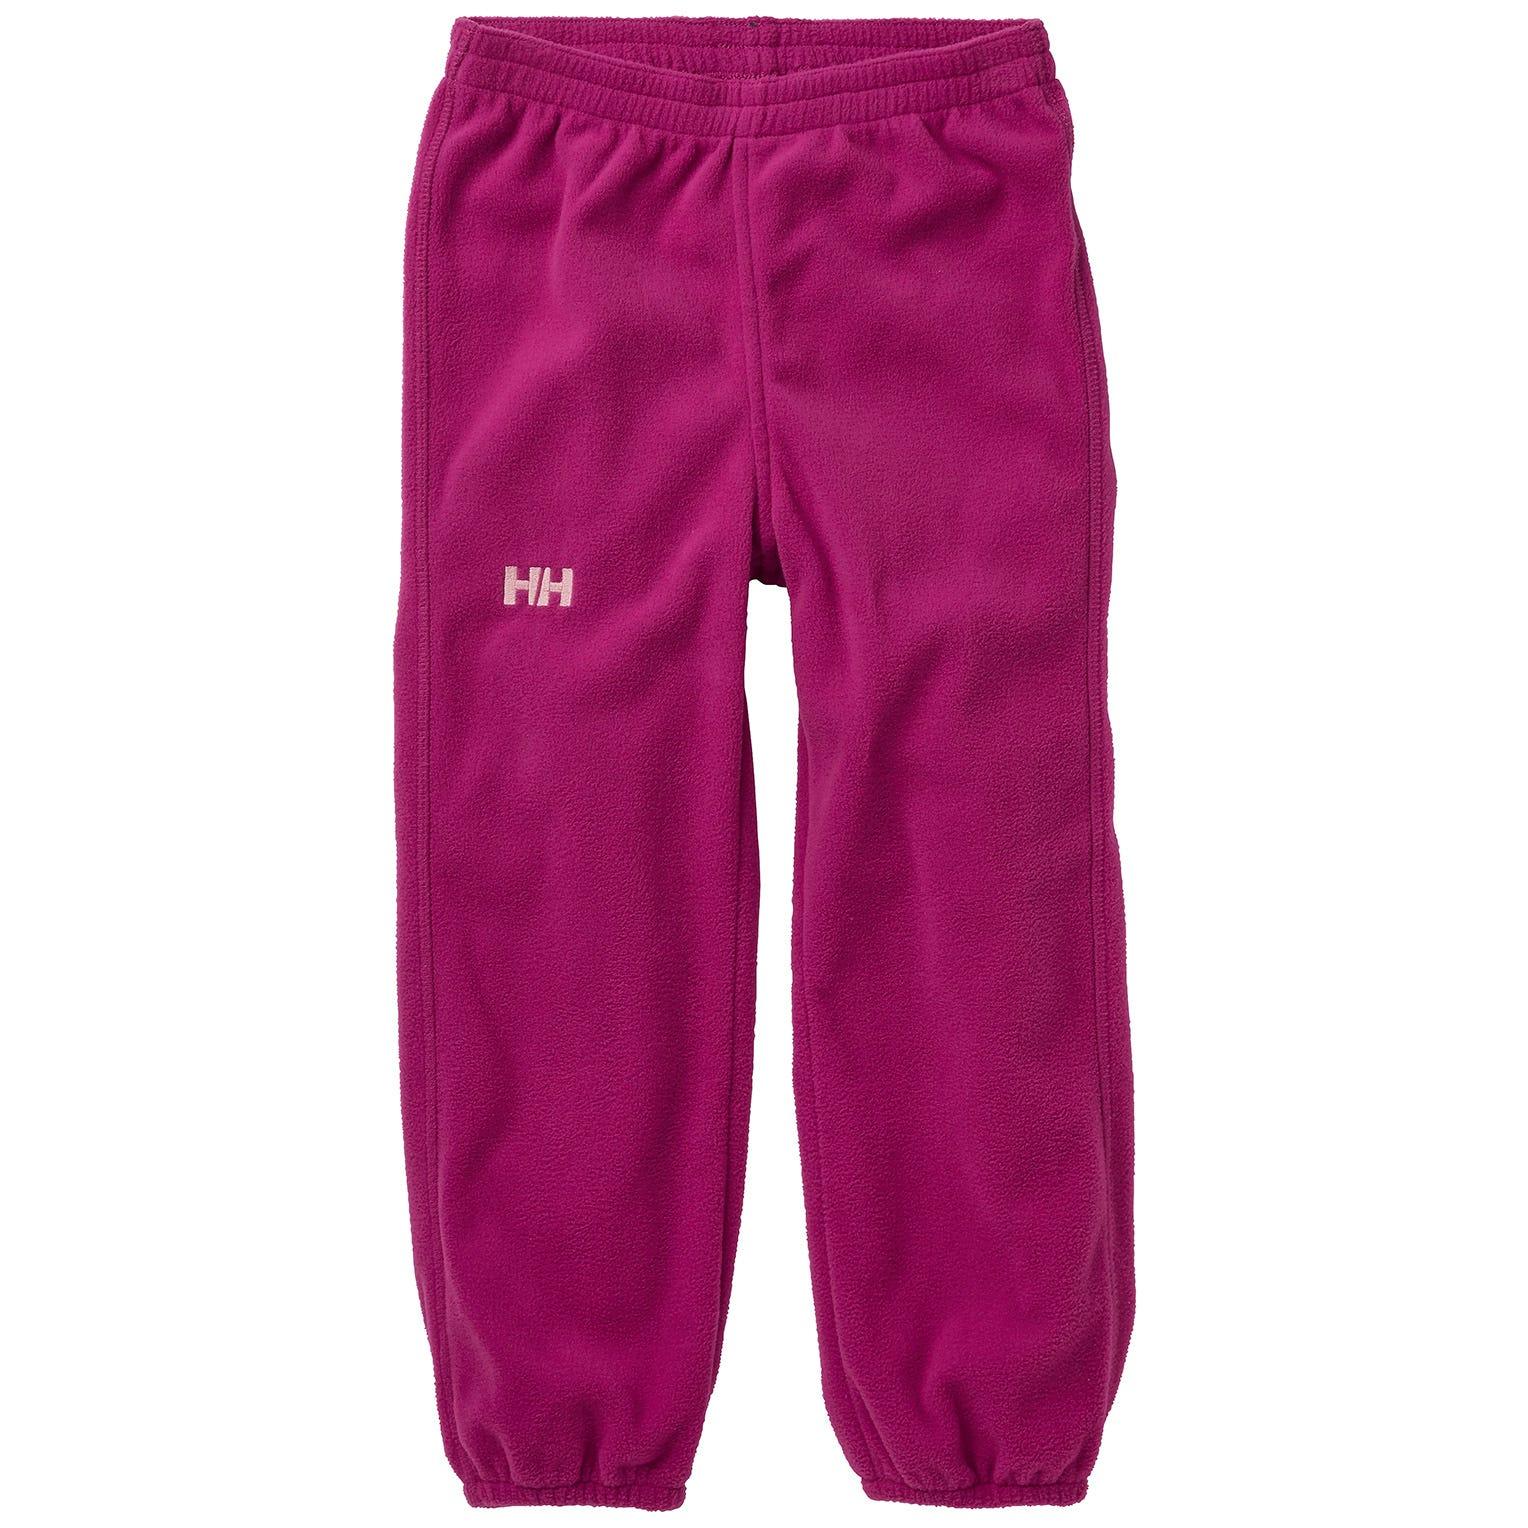 Helly Hansen Kids Daybreaker Fleece Pant Yellow 92/2